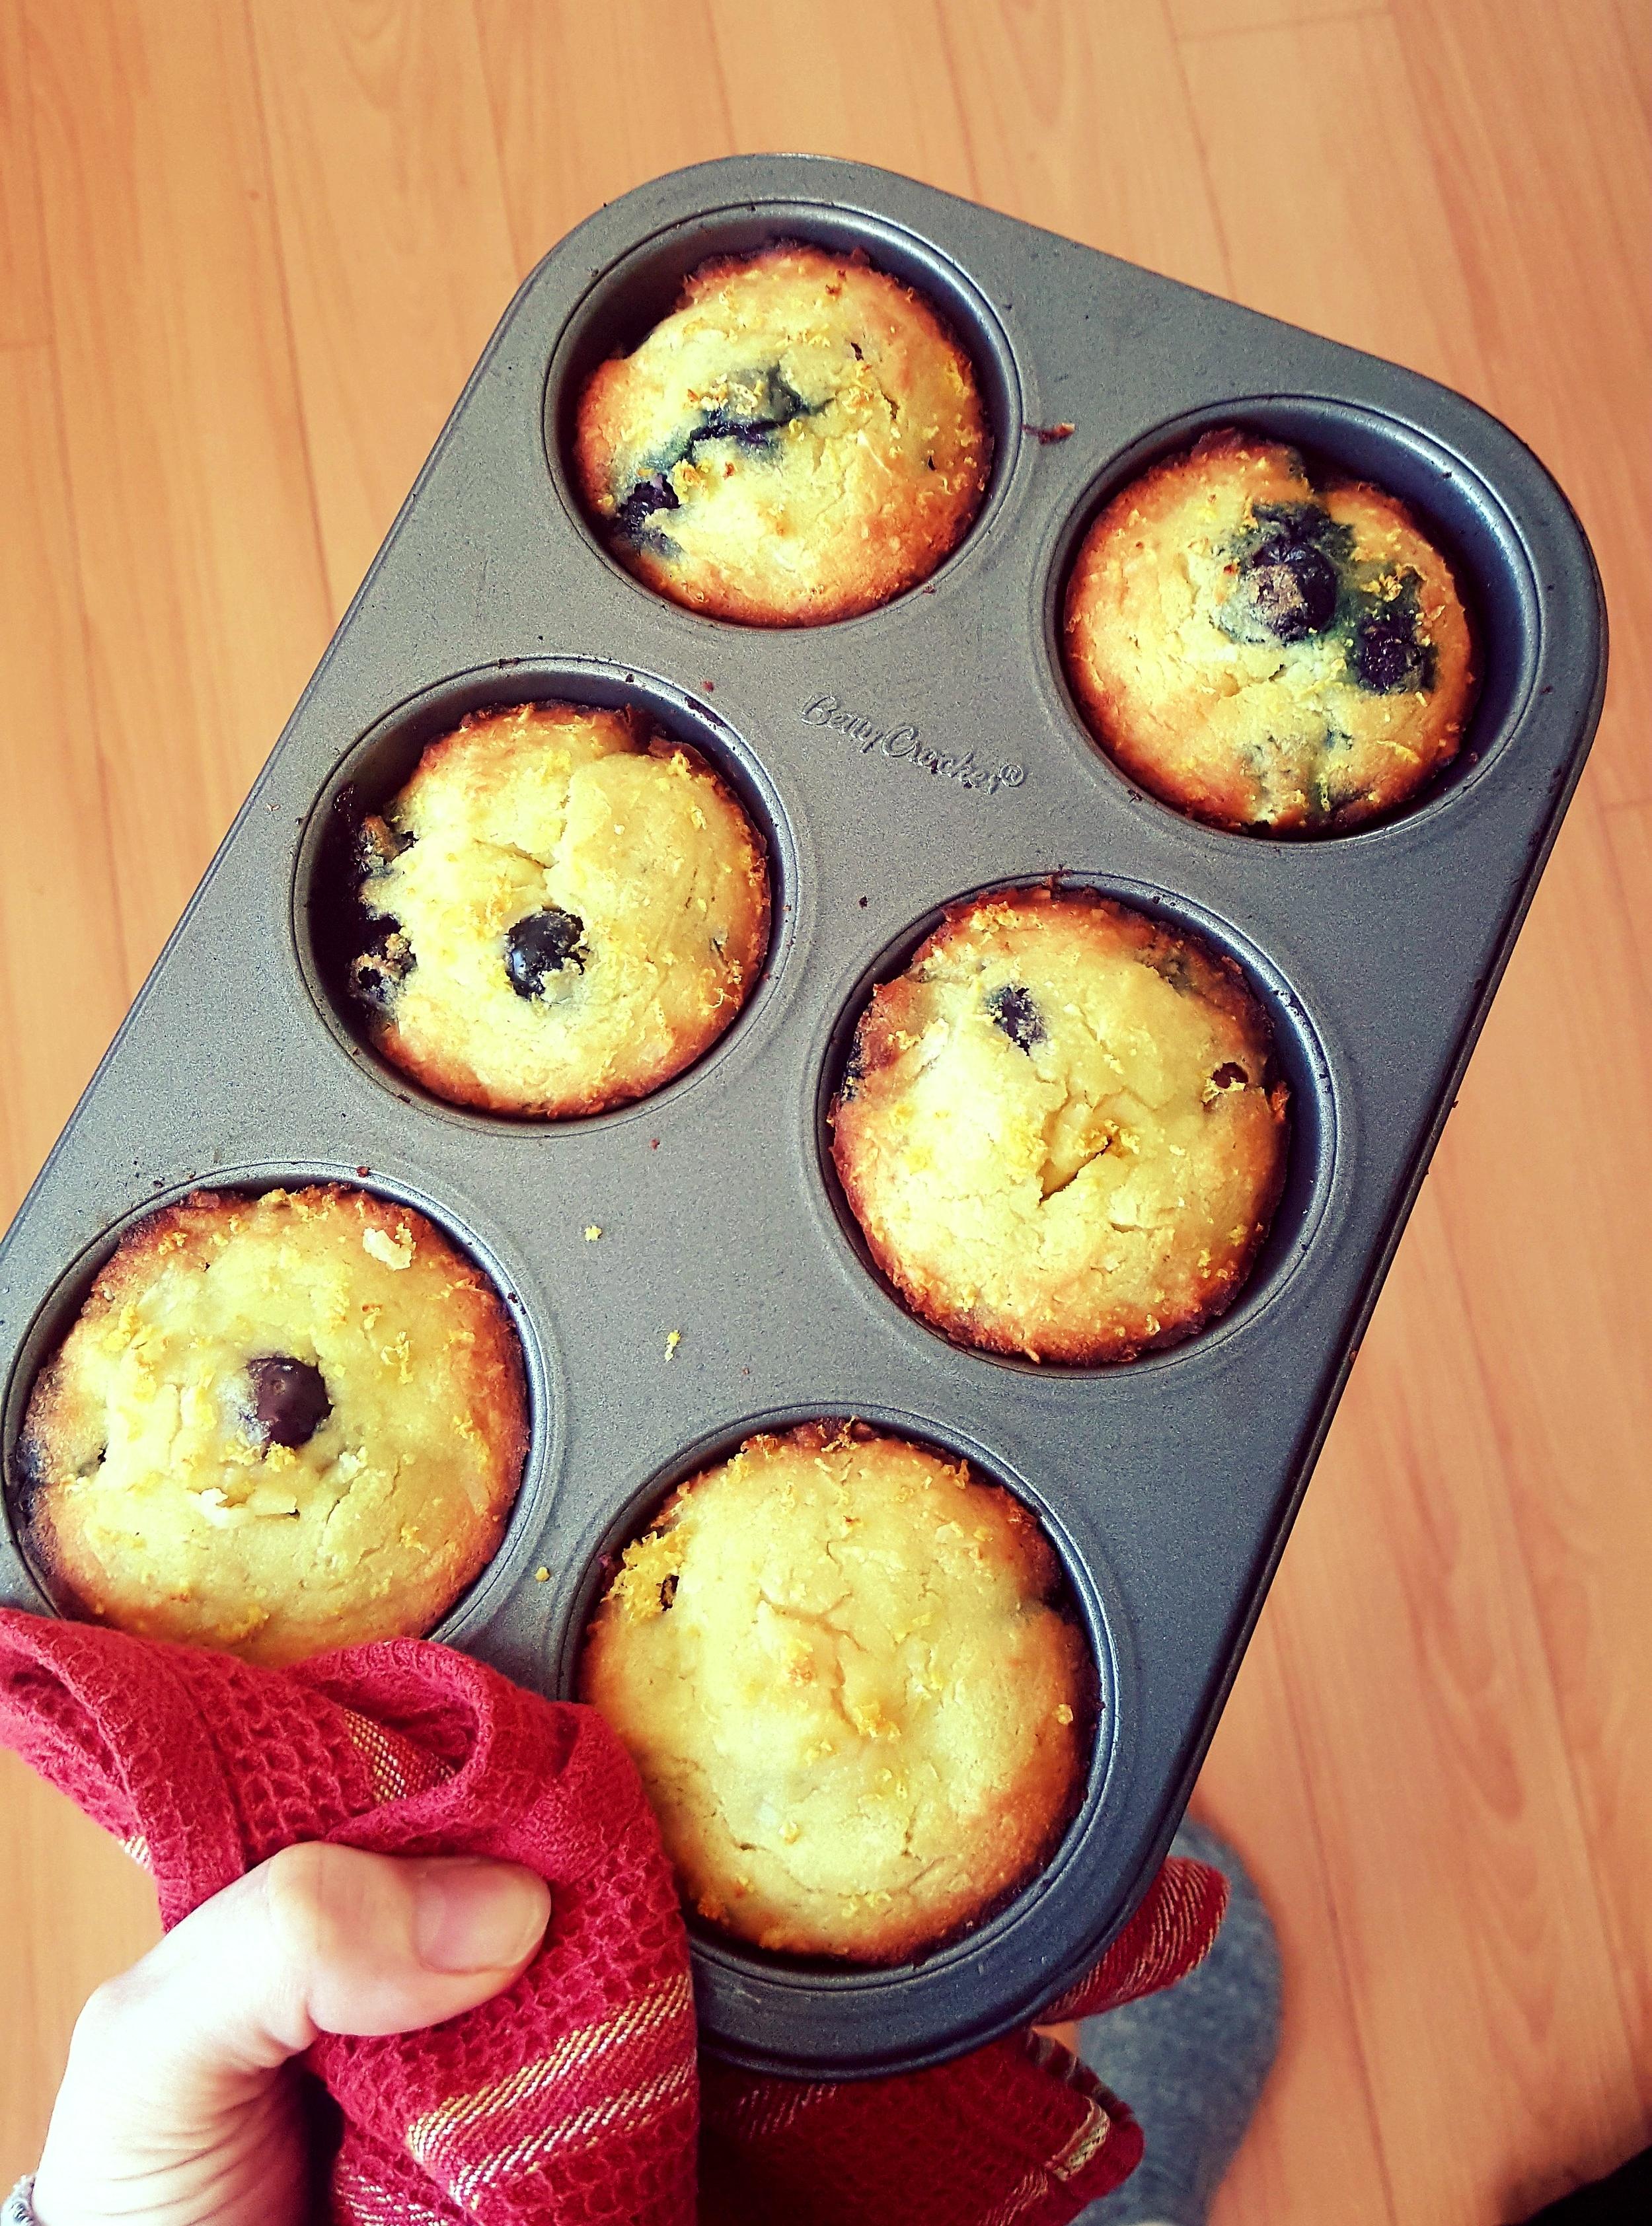 Blueberry & Lemon Muffins - Add local blueberries & organic lemon zest!